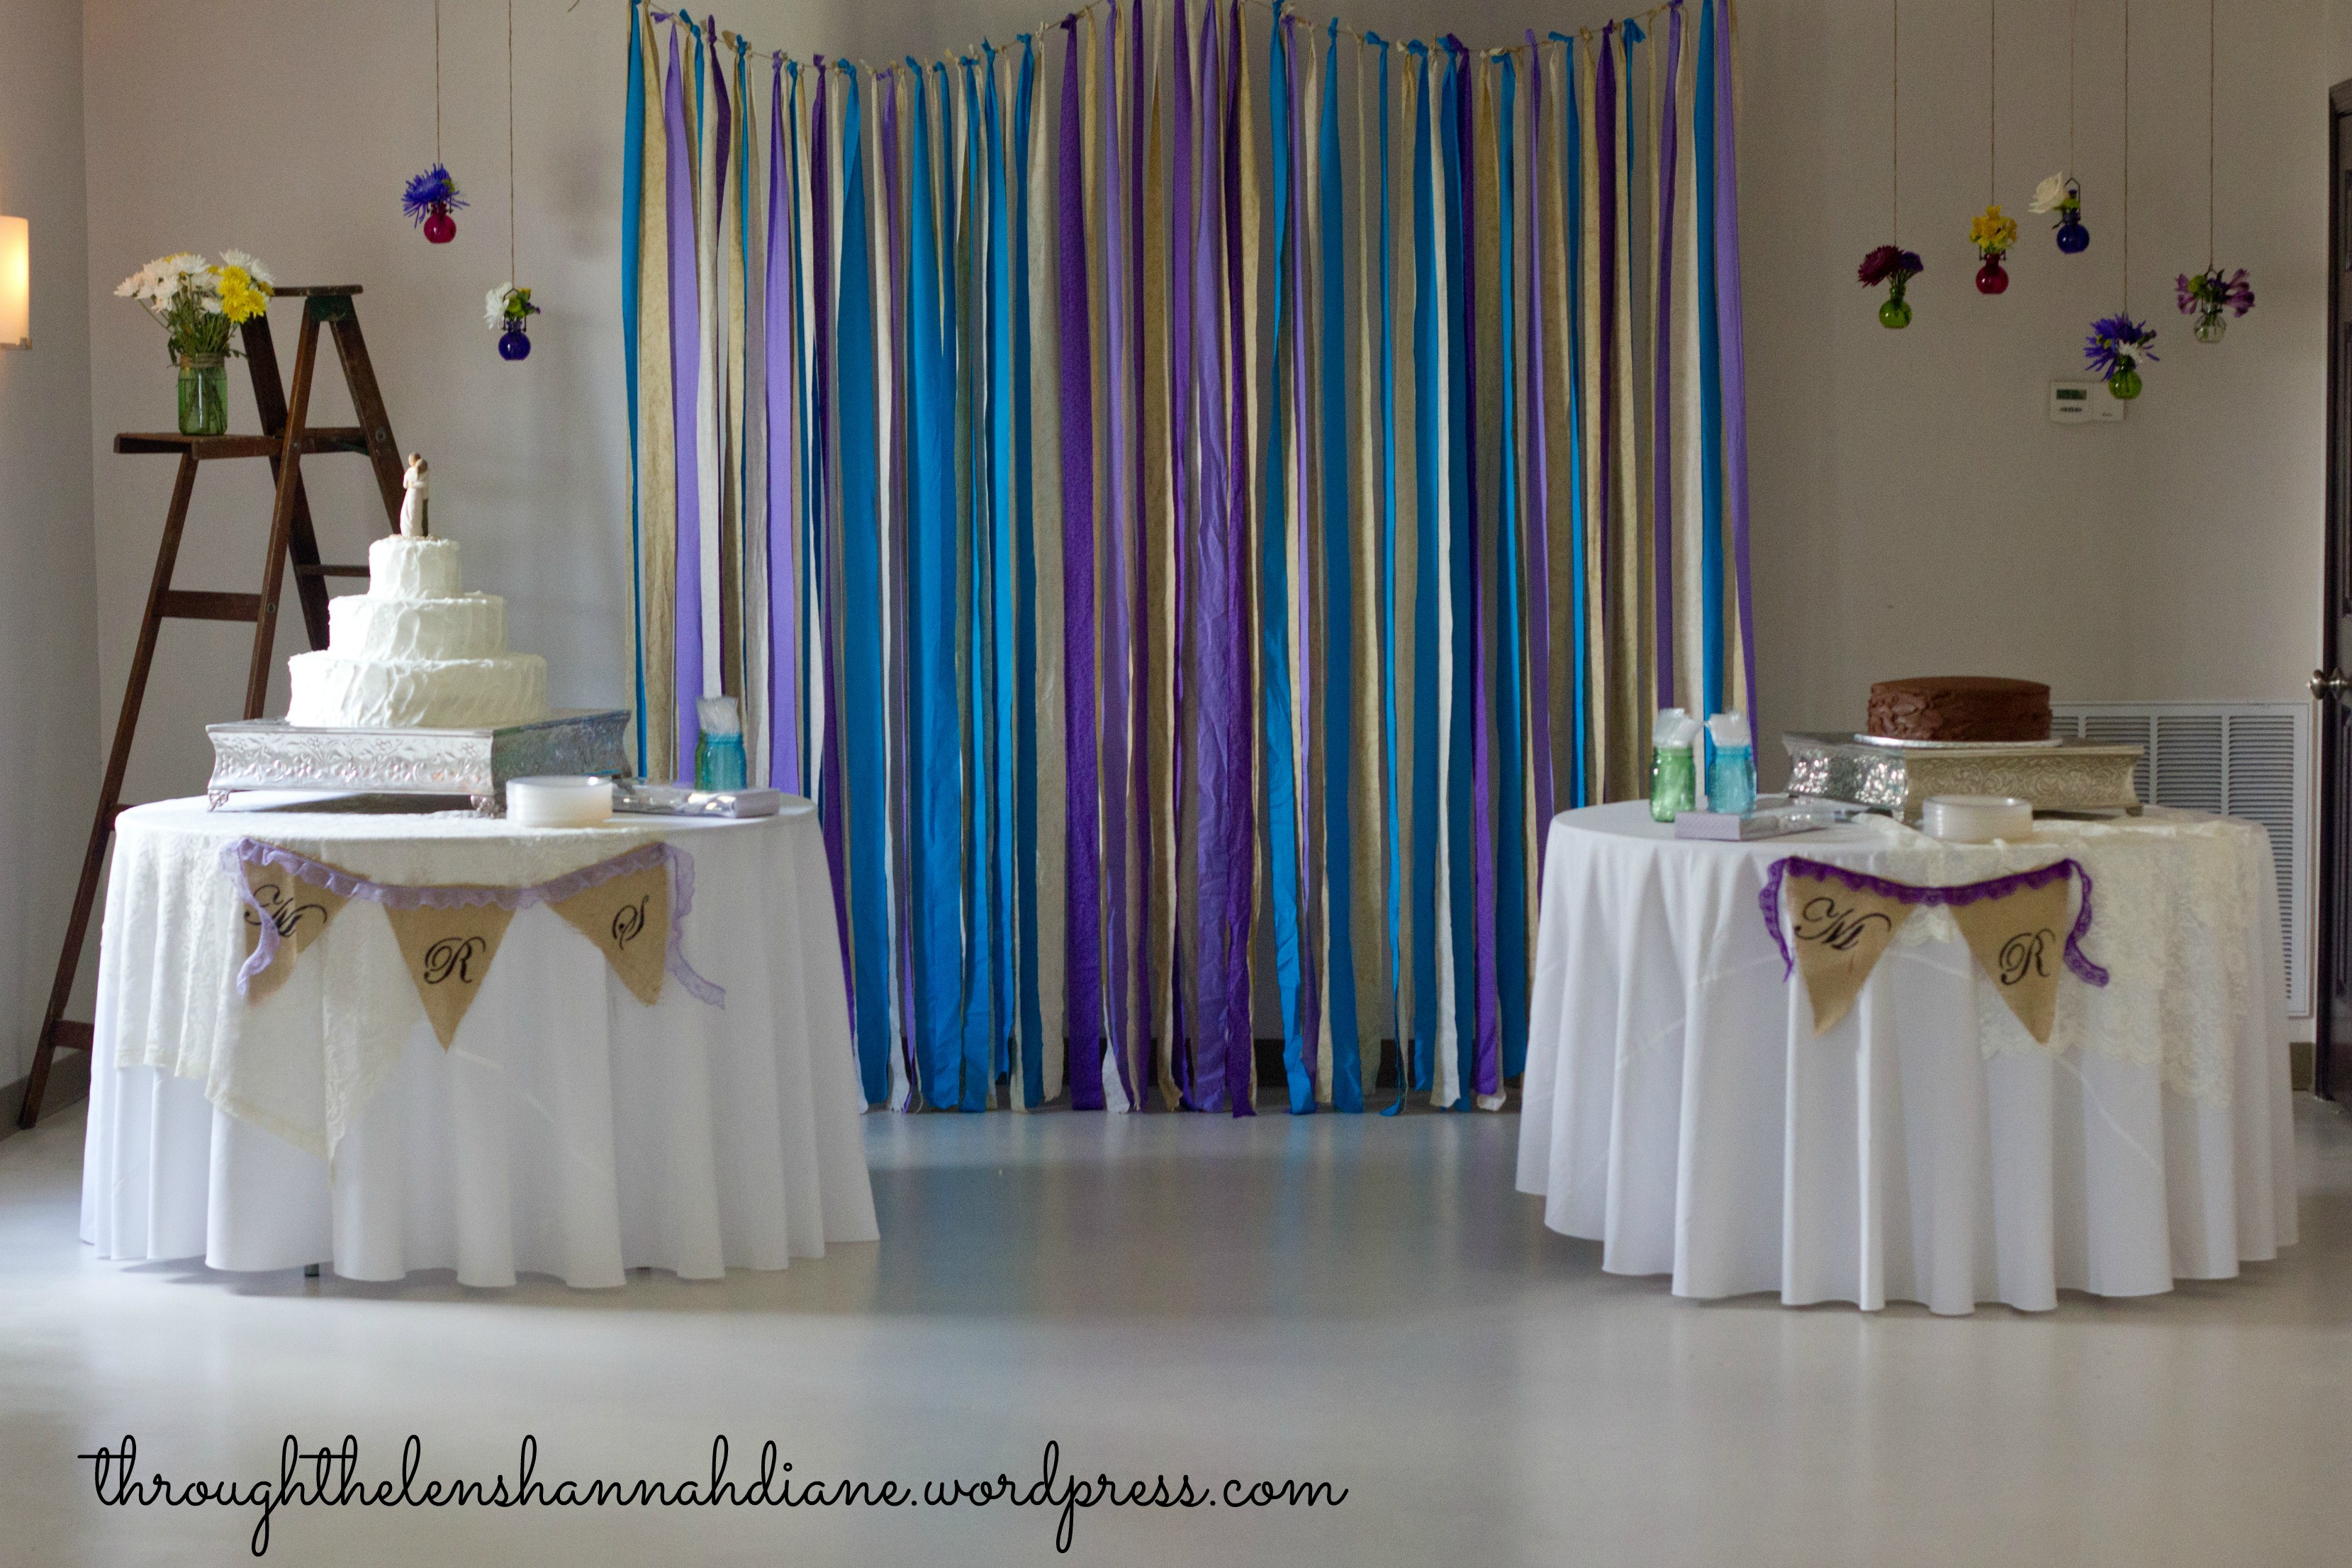 Best ideas about DIY Wedding Reception . Save or Pin My DIY Wedding Now.